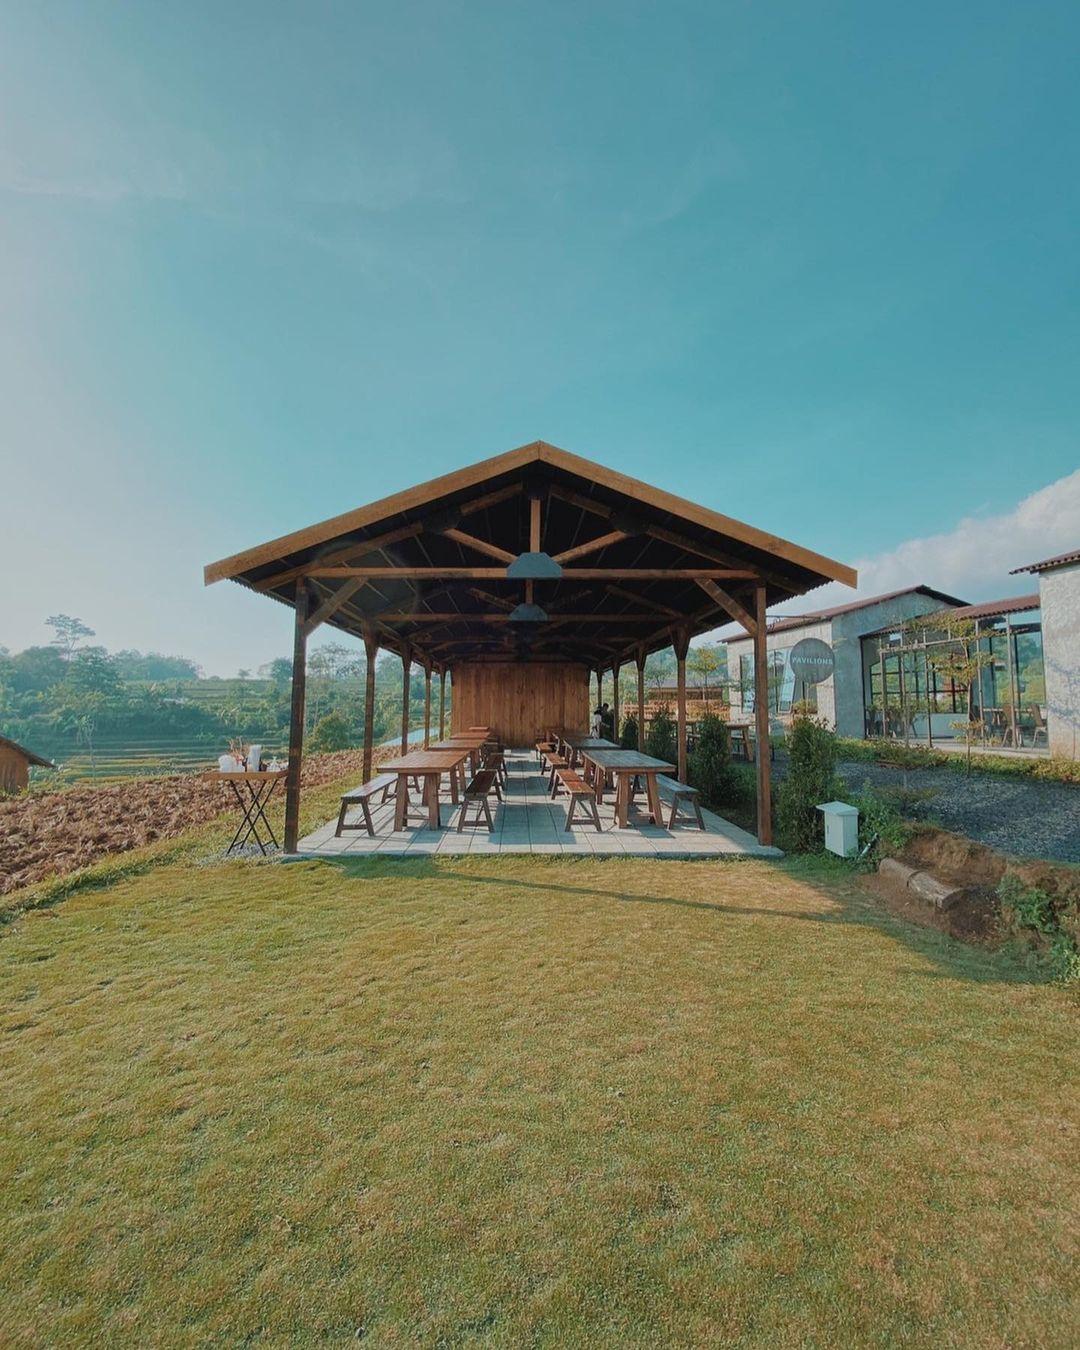 Tempat Outdoor Di Rustic Market Mojokerto Image From @niceplace Sub_